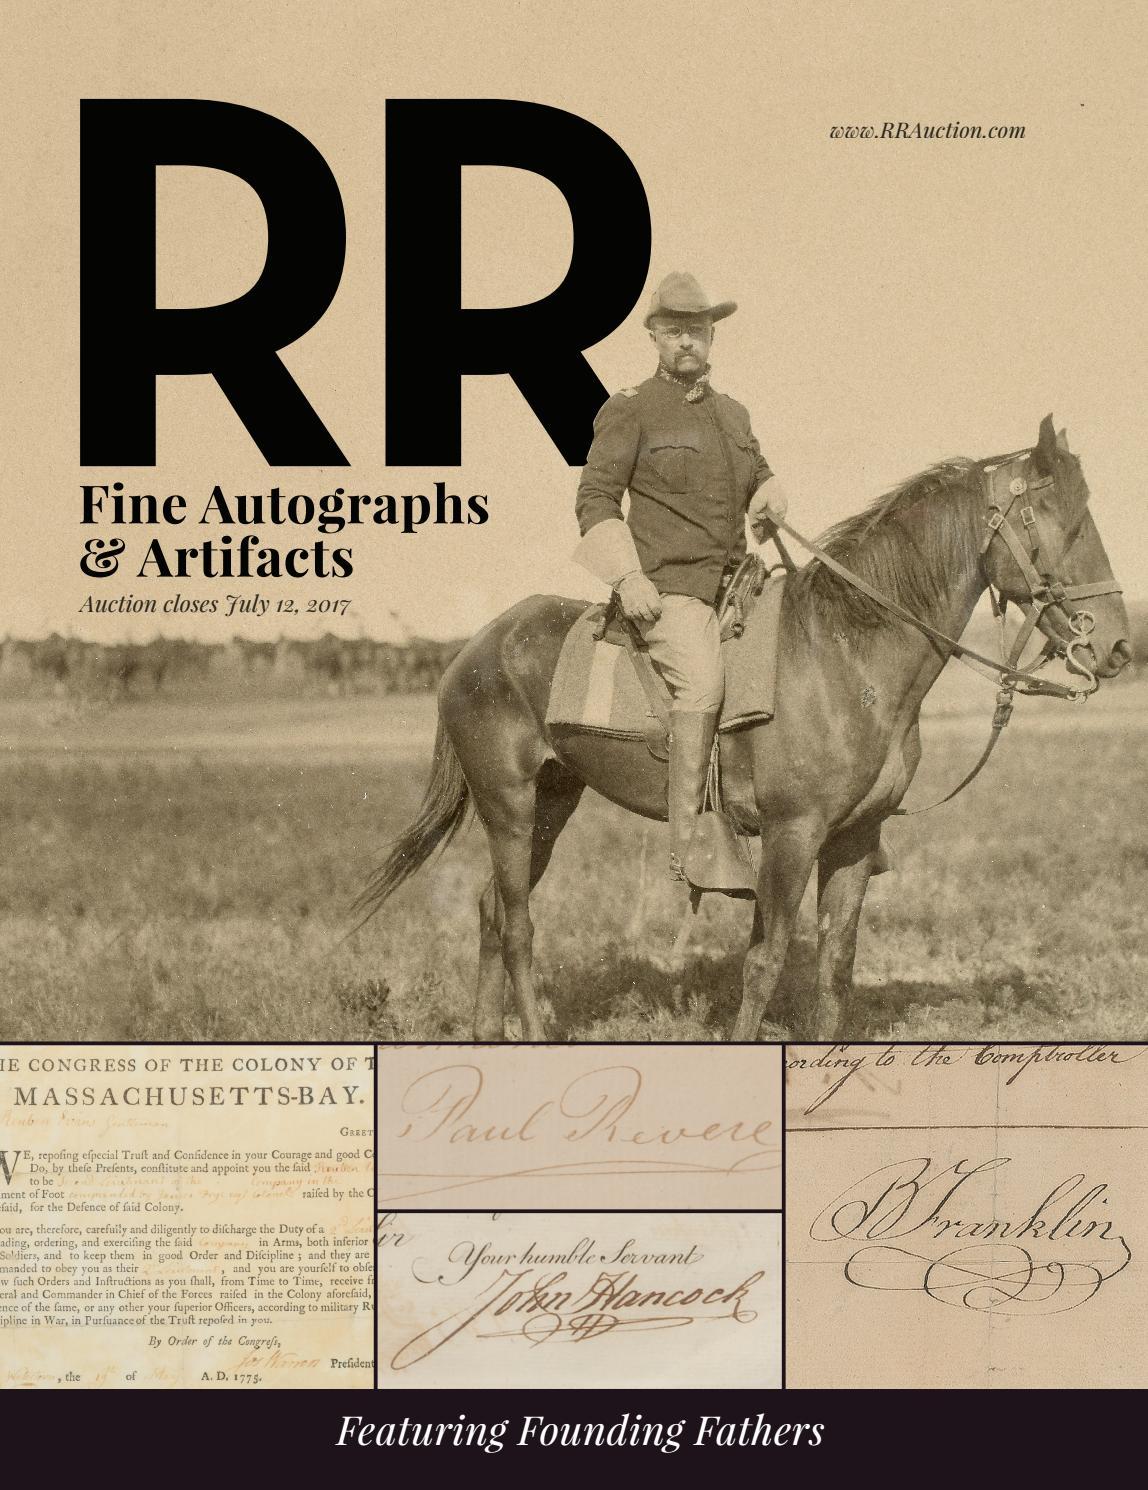 Rr Autograph Auctions Consignment Agreement: RR Auction: July 2017 Fine Autograph And Artifact Auction